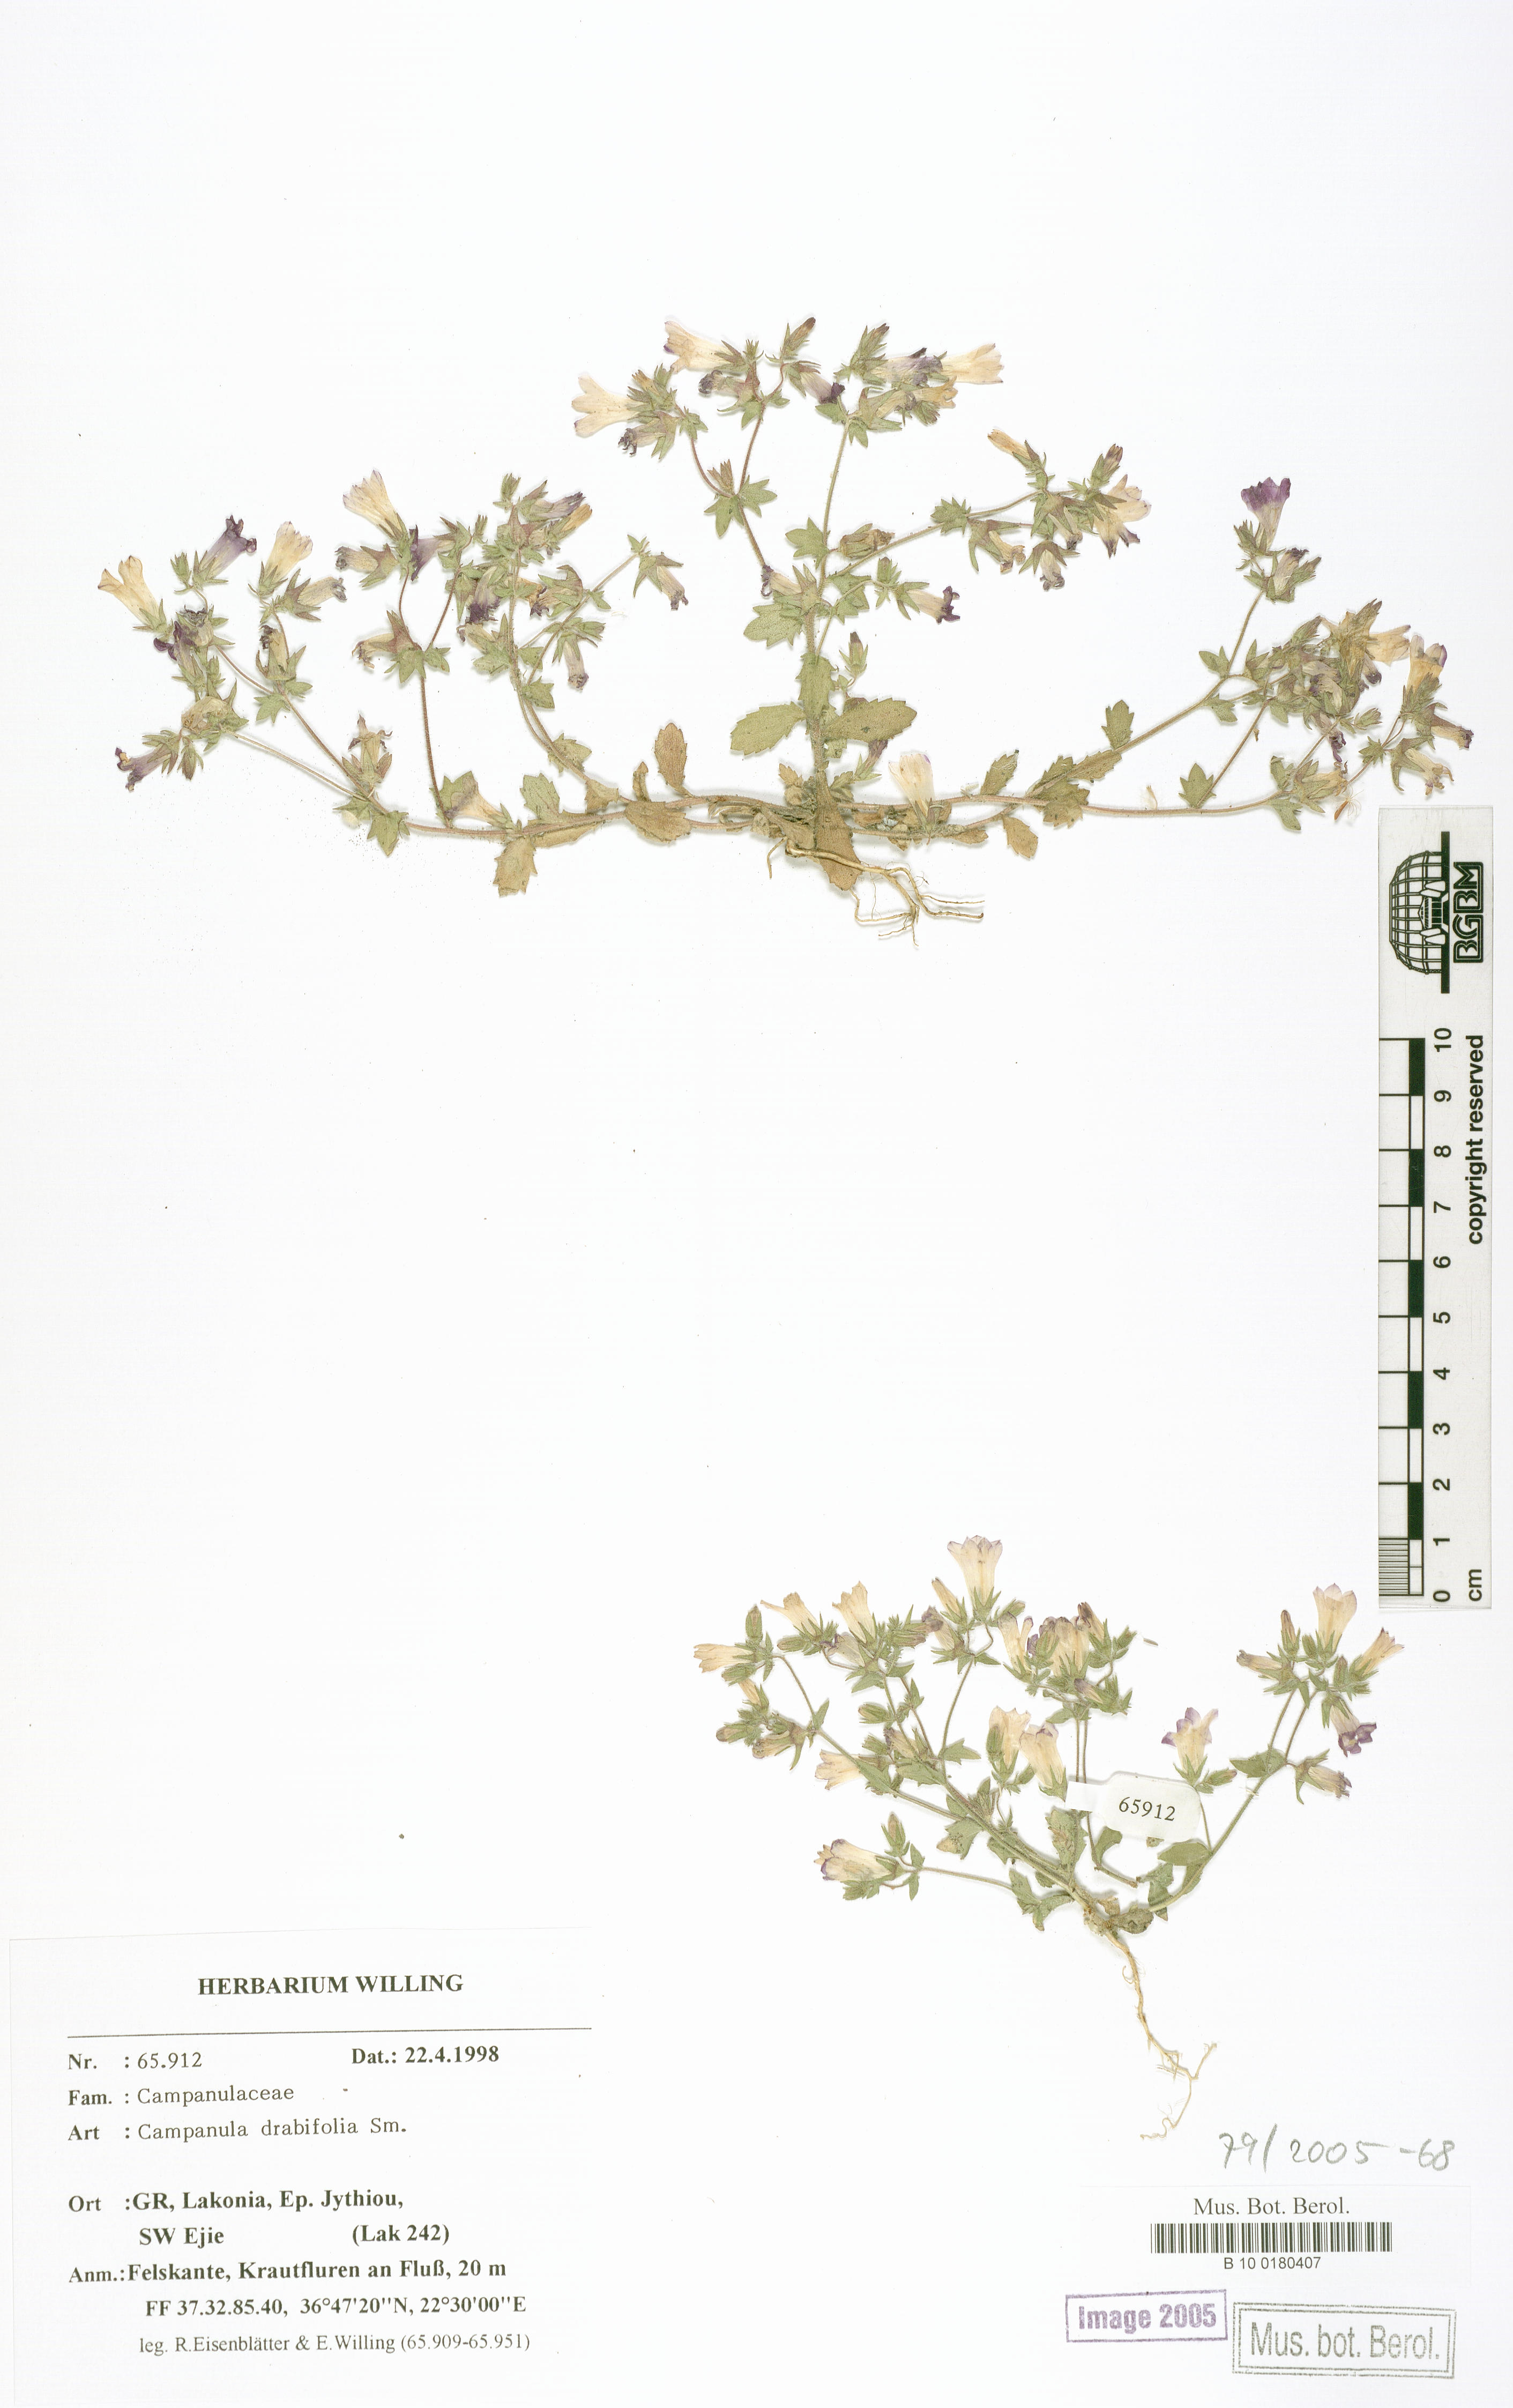 http://ww2.bgbm.org/herbarium/images/B/10/01/80/40/B_10_0180407.jpg